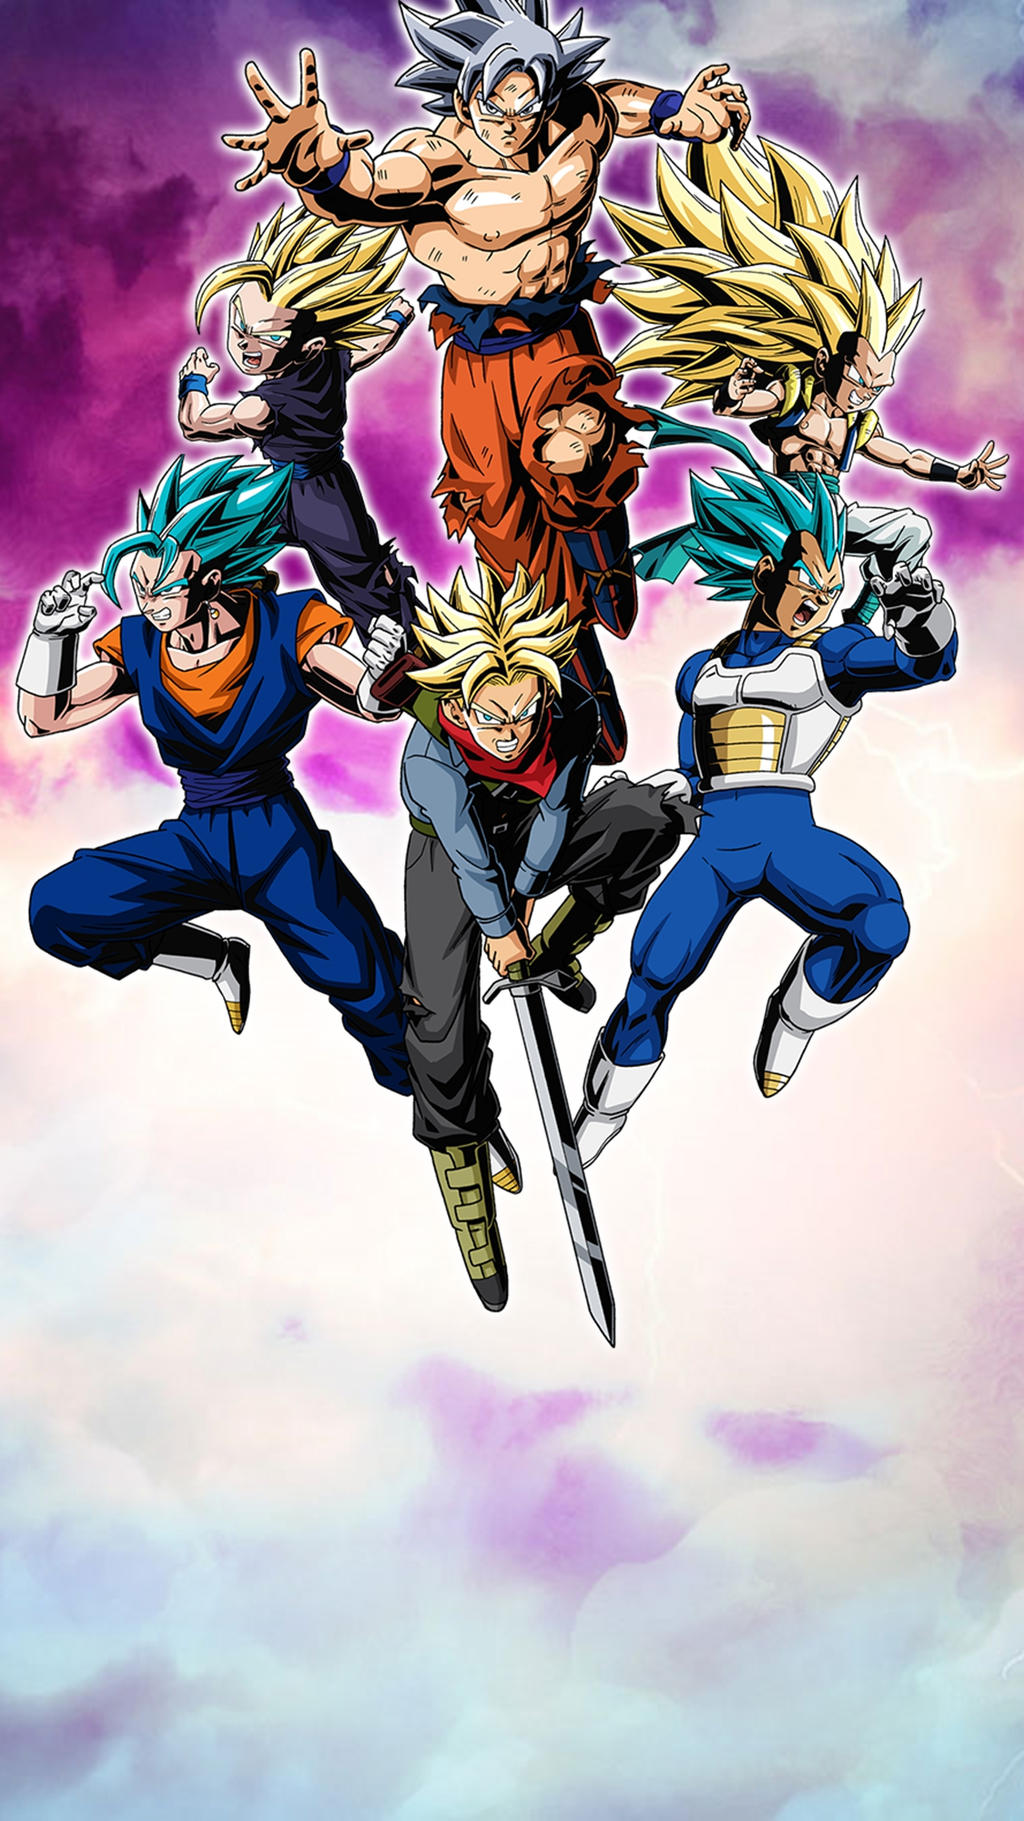 Super Dragon Ball Heroes Wallpaper Mobile By Hokage455 On Deviantart